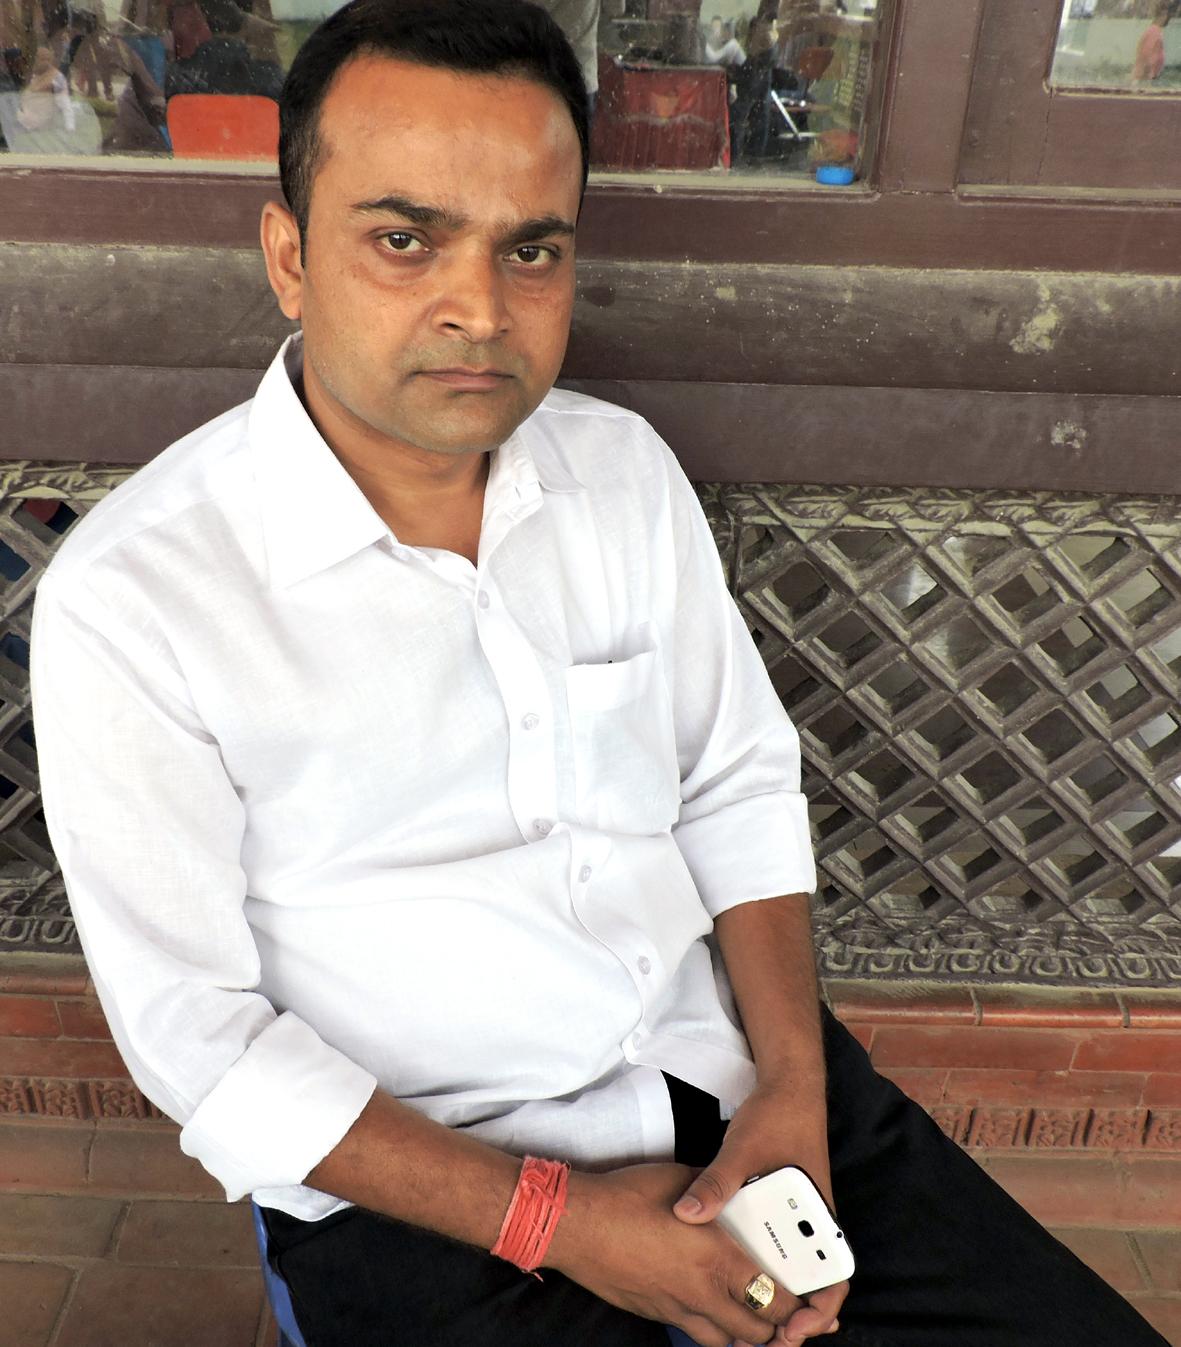 कुमार ज्ञानेन्द्र, राष्ट्रवादी युवा कांग्रेस, बिहार के अध्यक्ष हैं ।